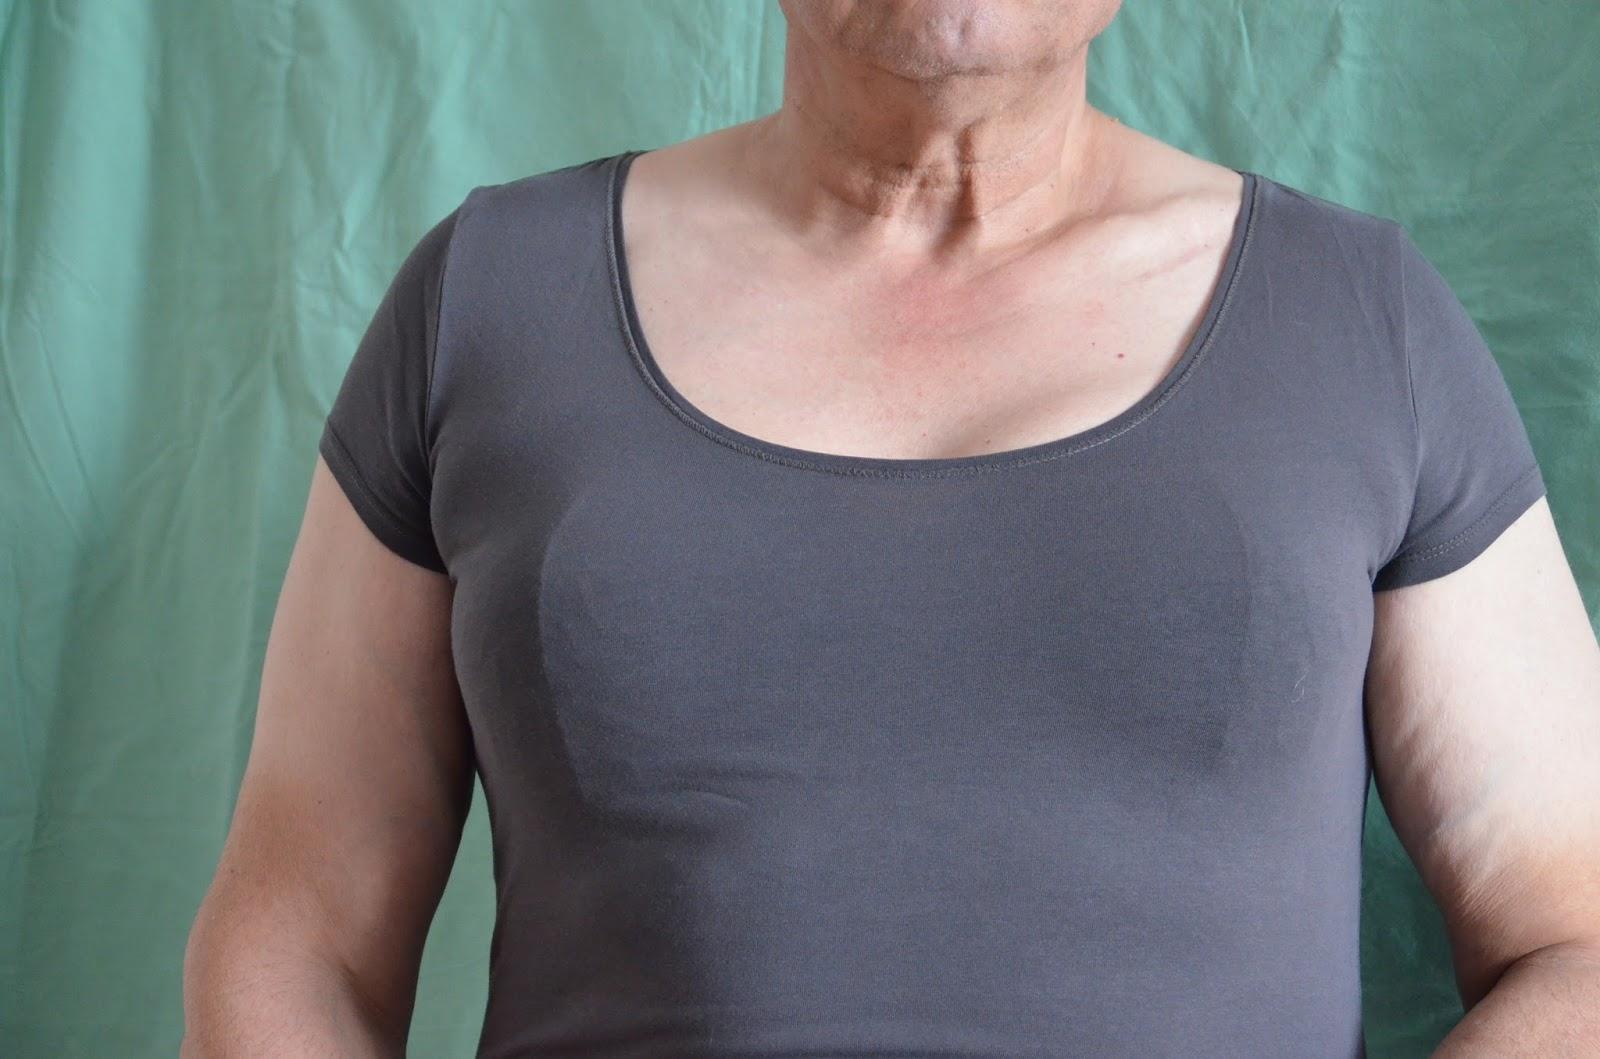 Men caught naked in public